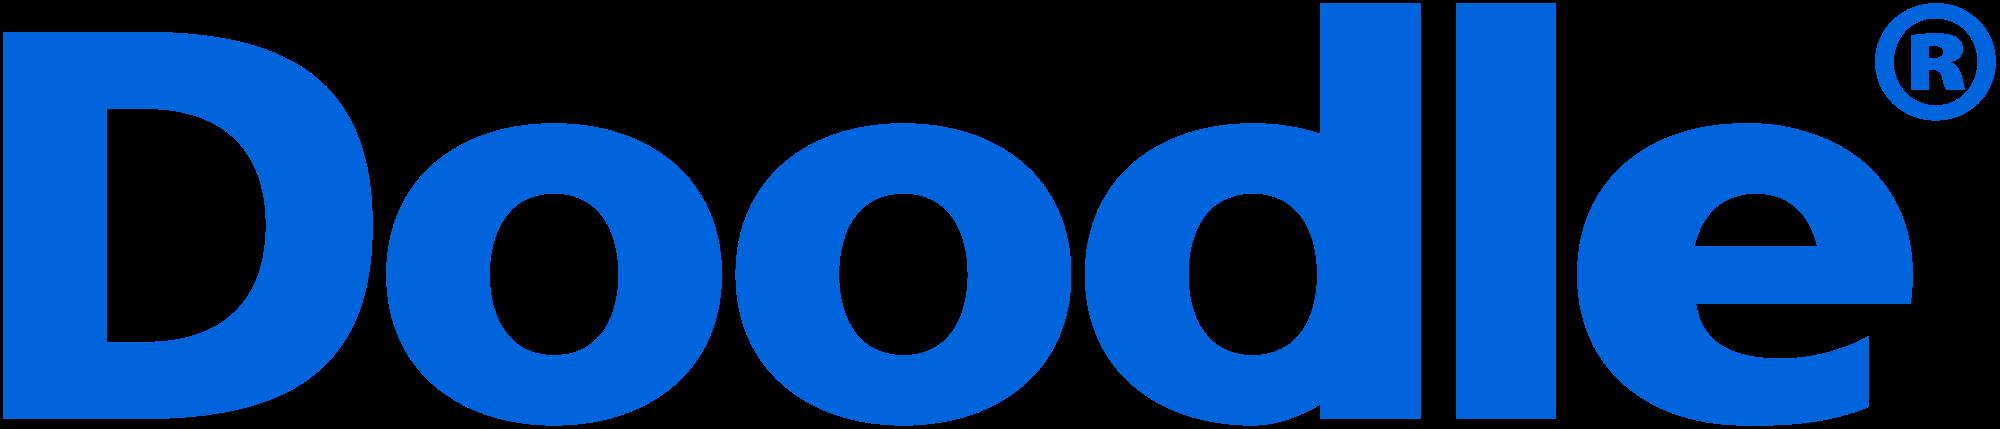 Doodle_Logo.png